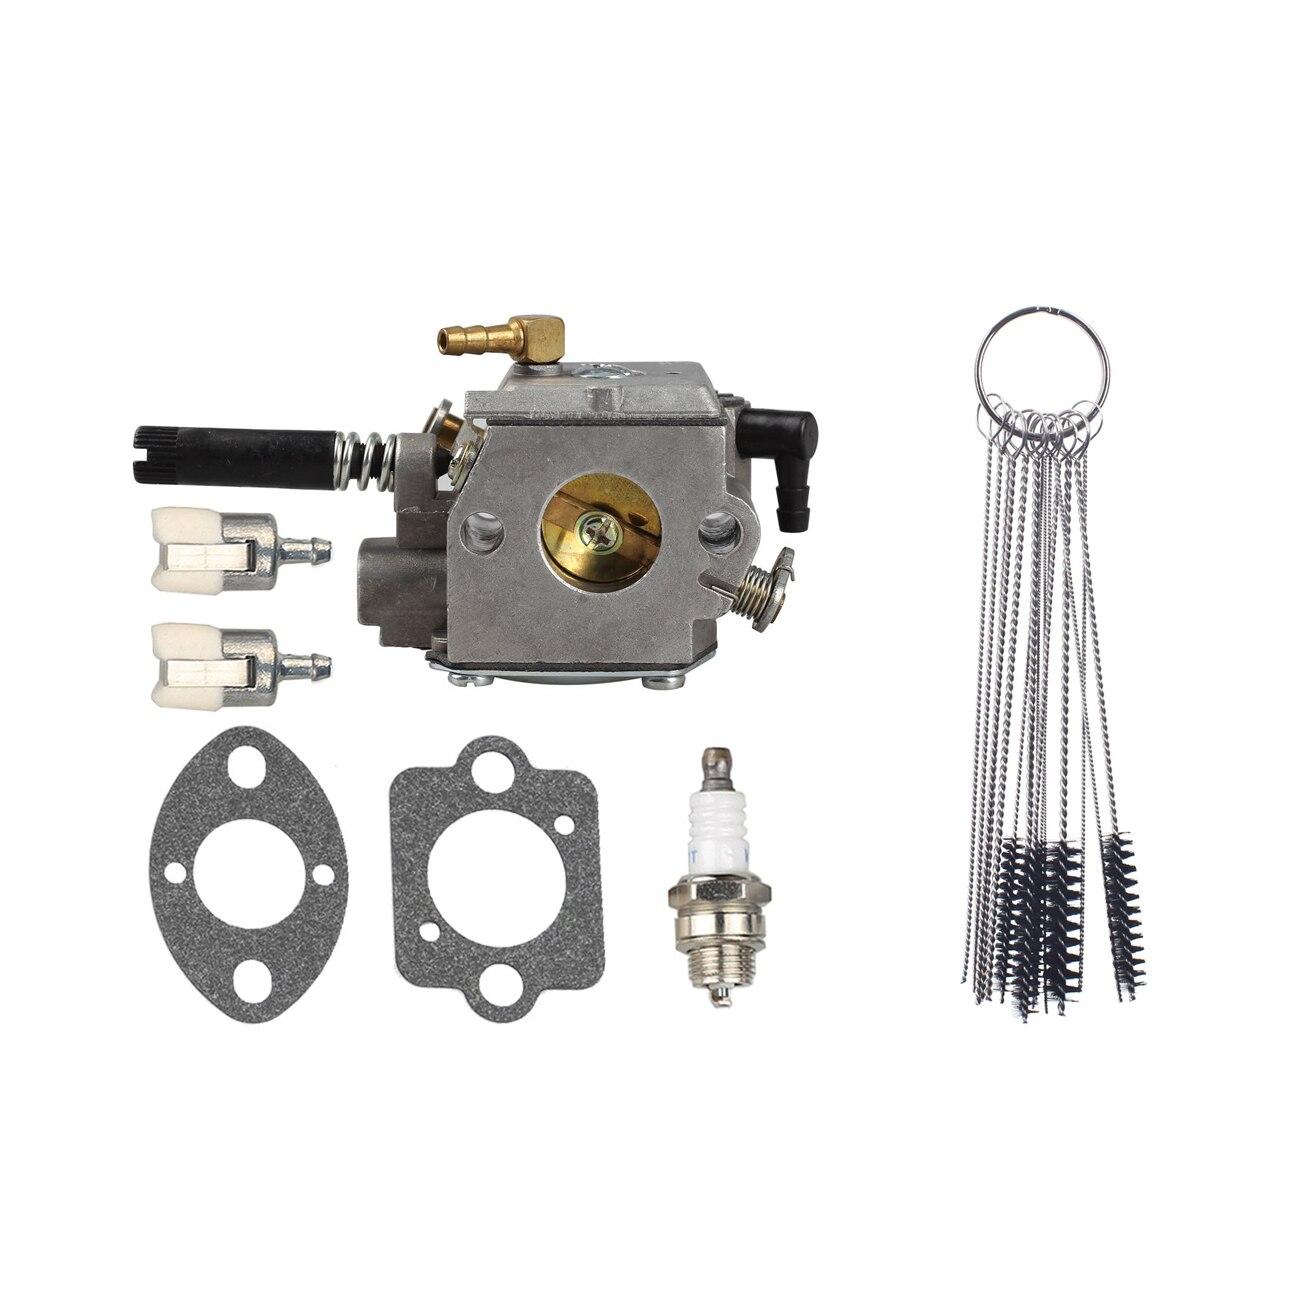 Carburetor Cleaning Brush For SHINDAIWA 488 CHAINSAW OEM A021003090 72365-81000